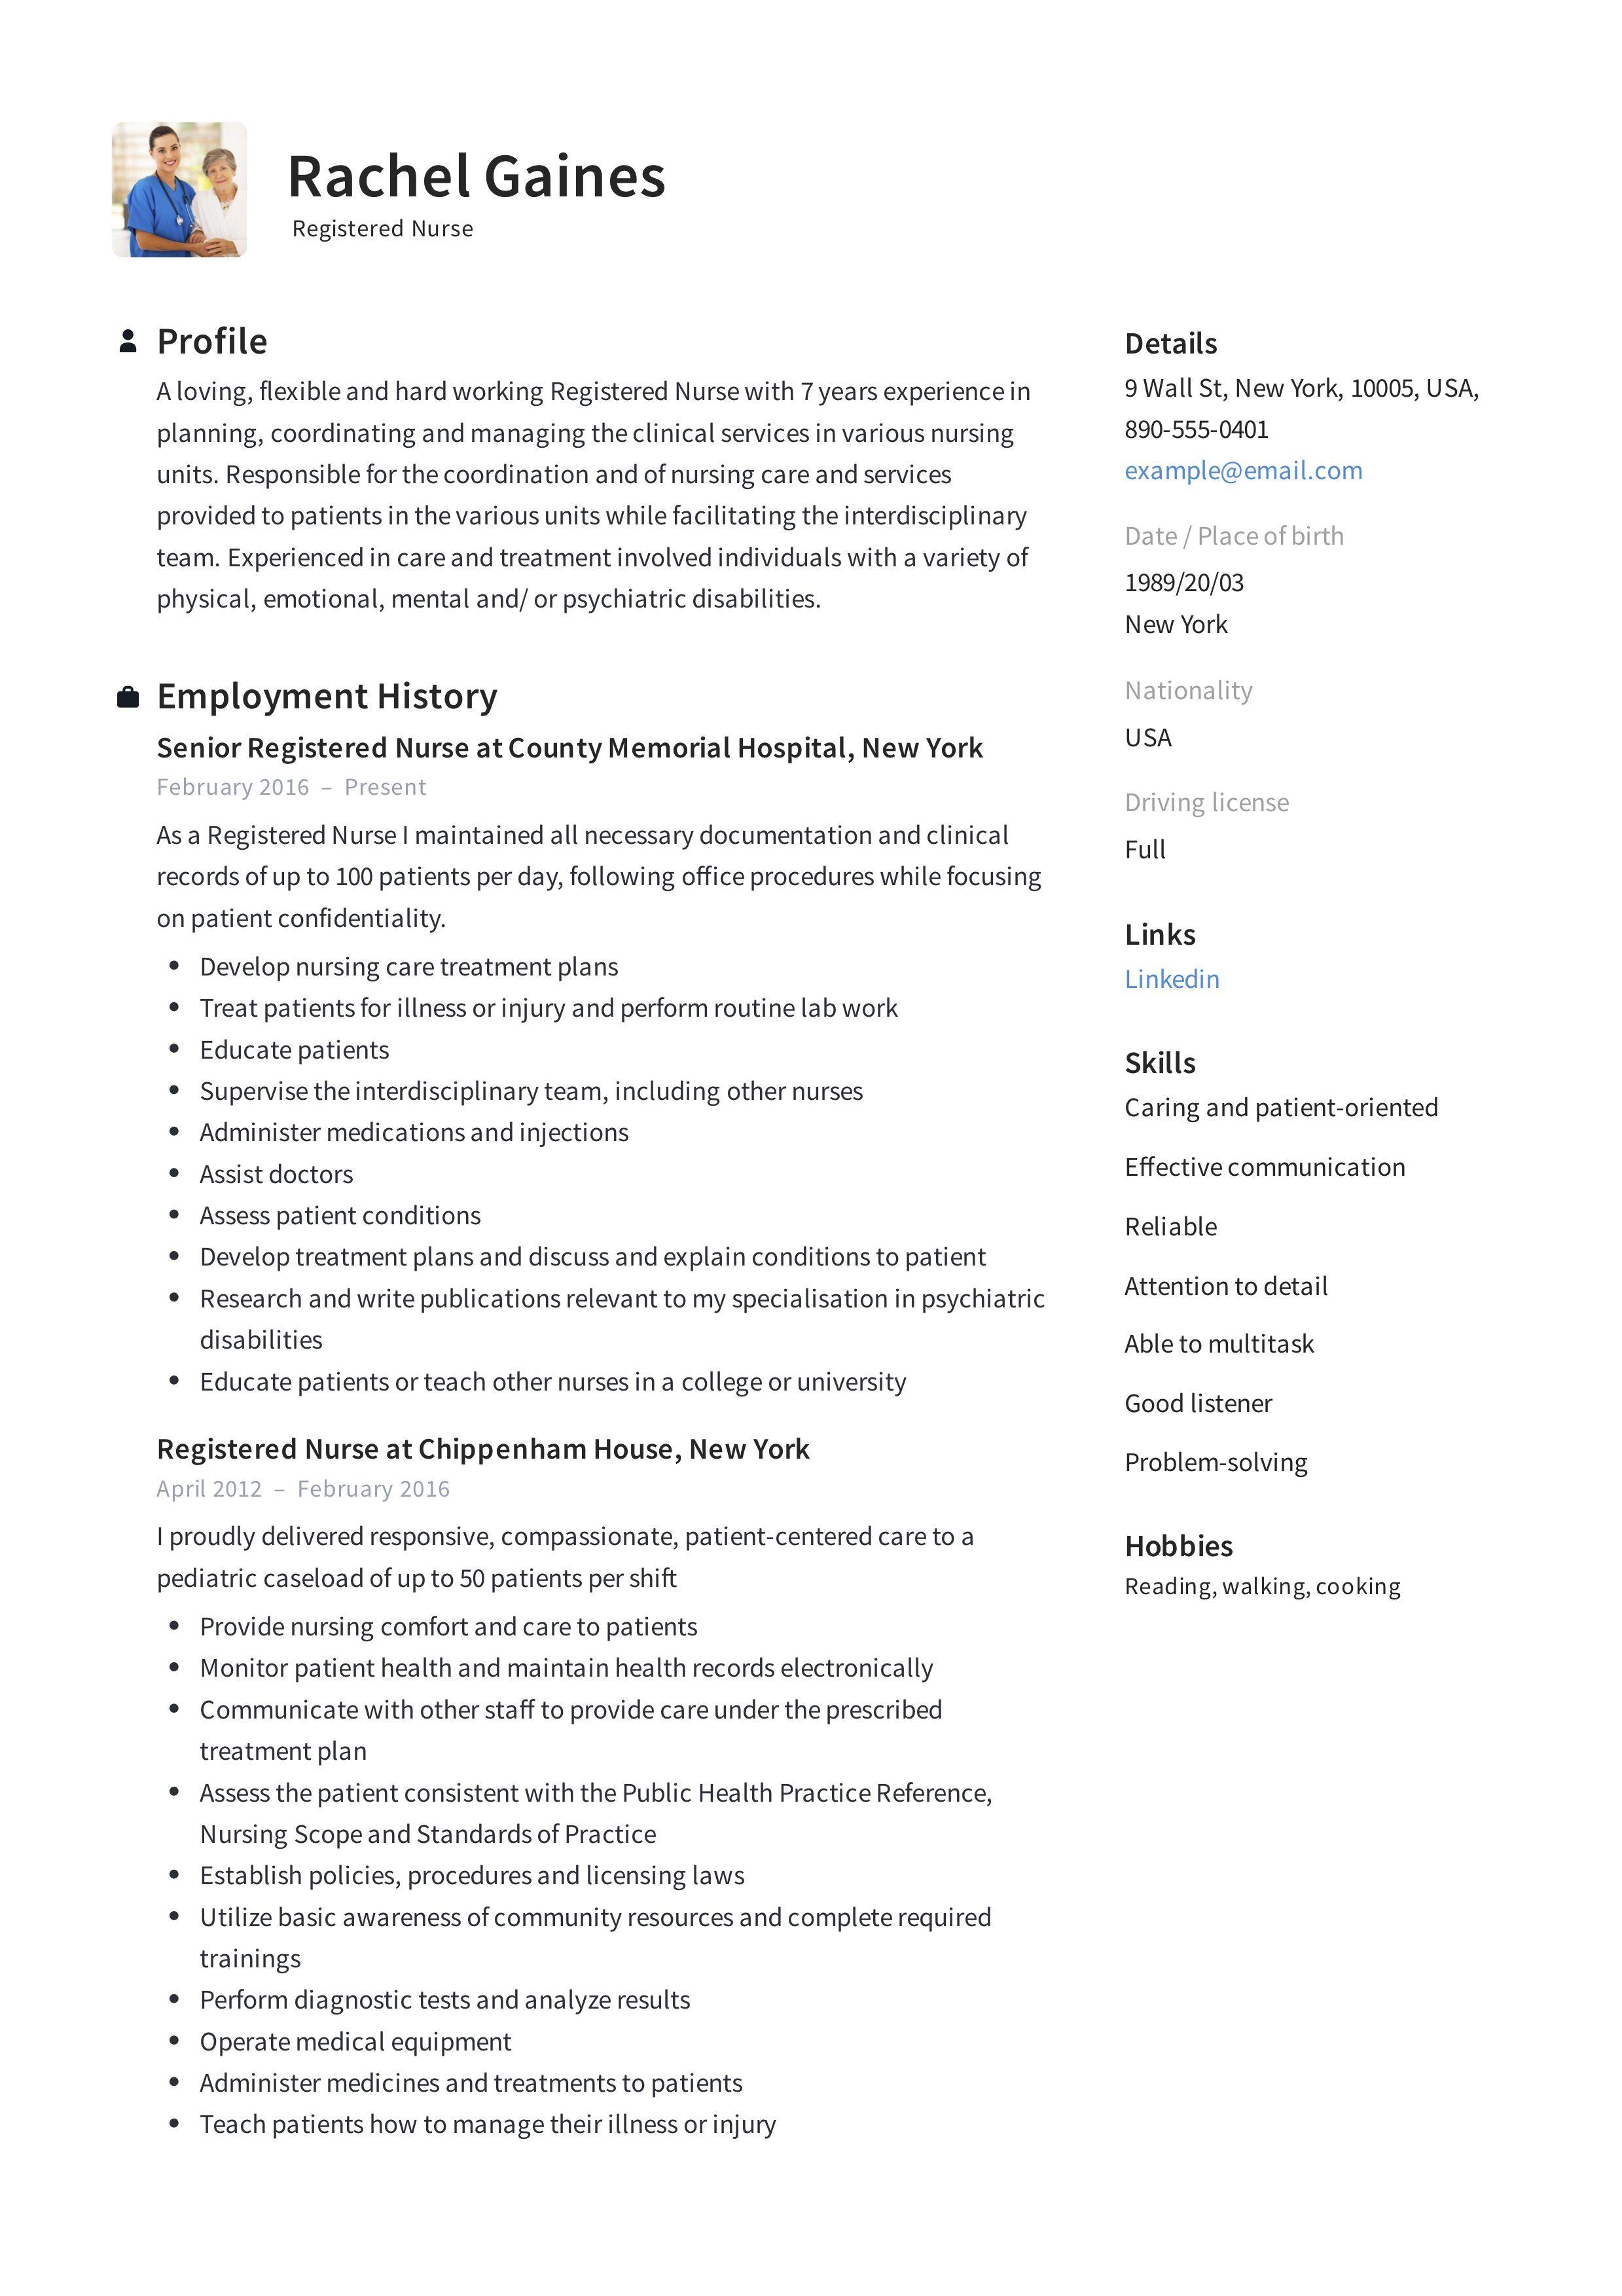 Registered Nurse Resume Sample & Writing Guide in 2020